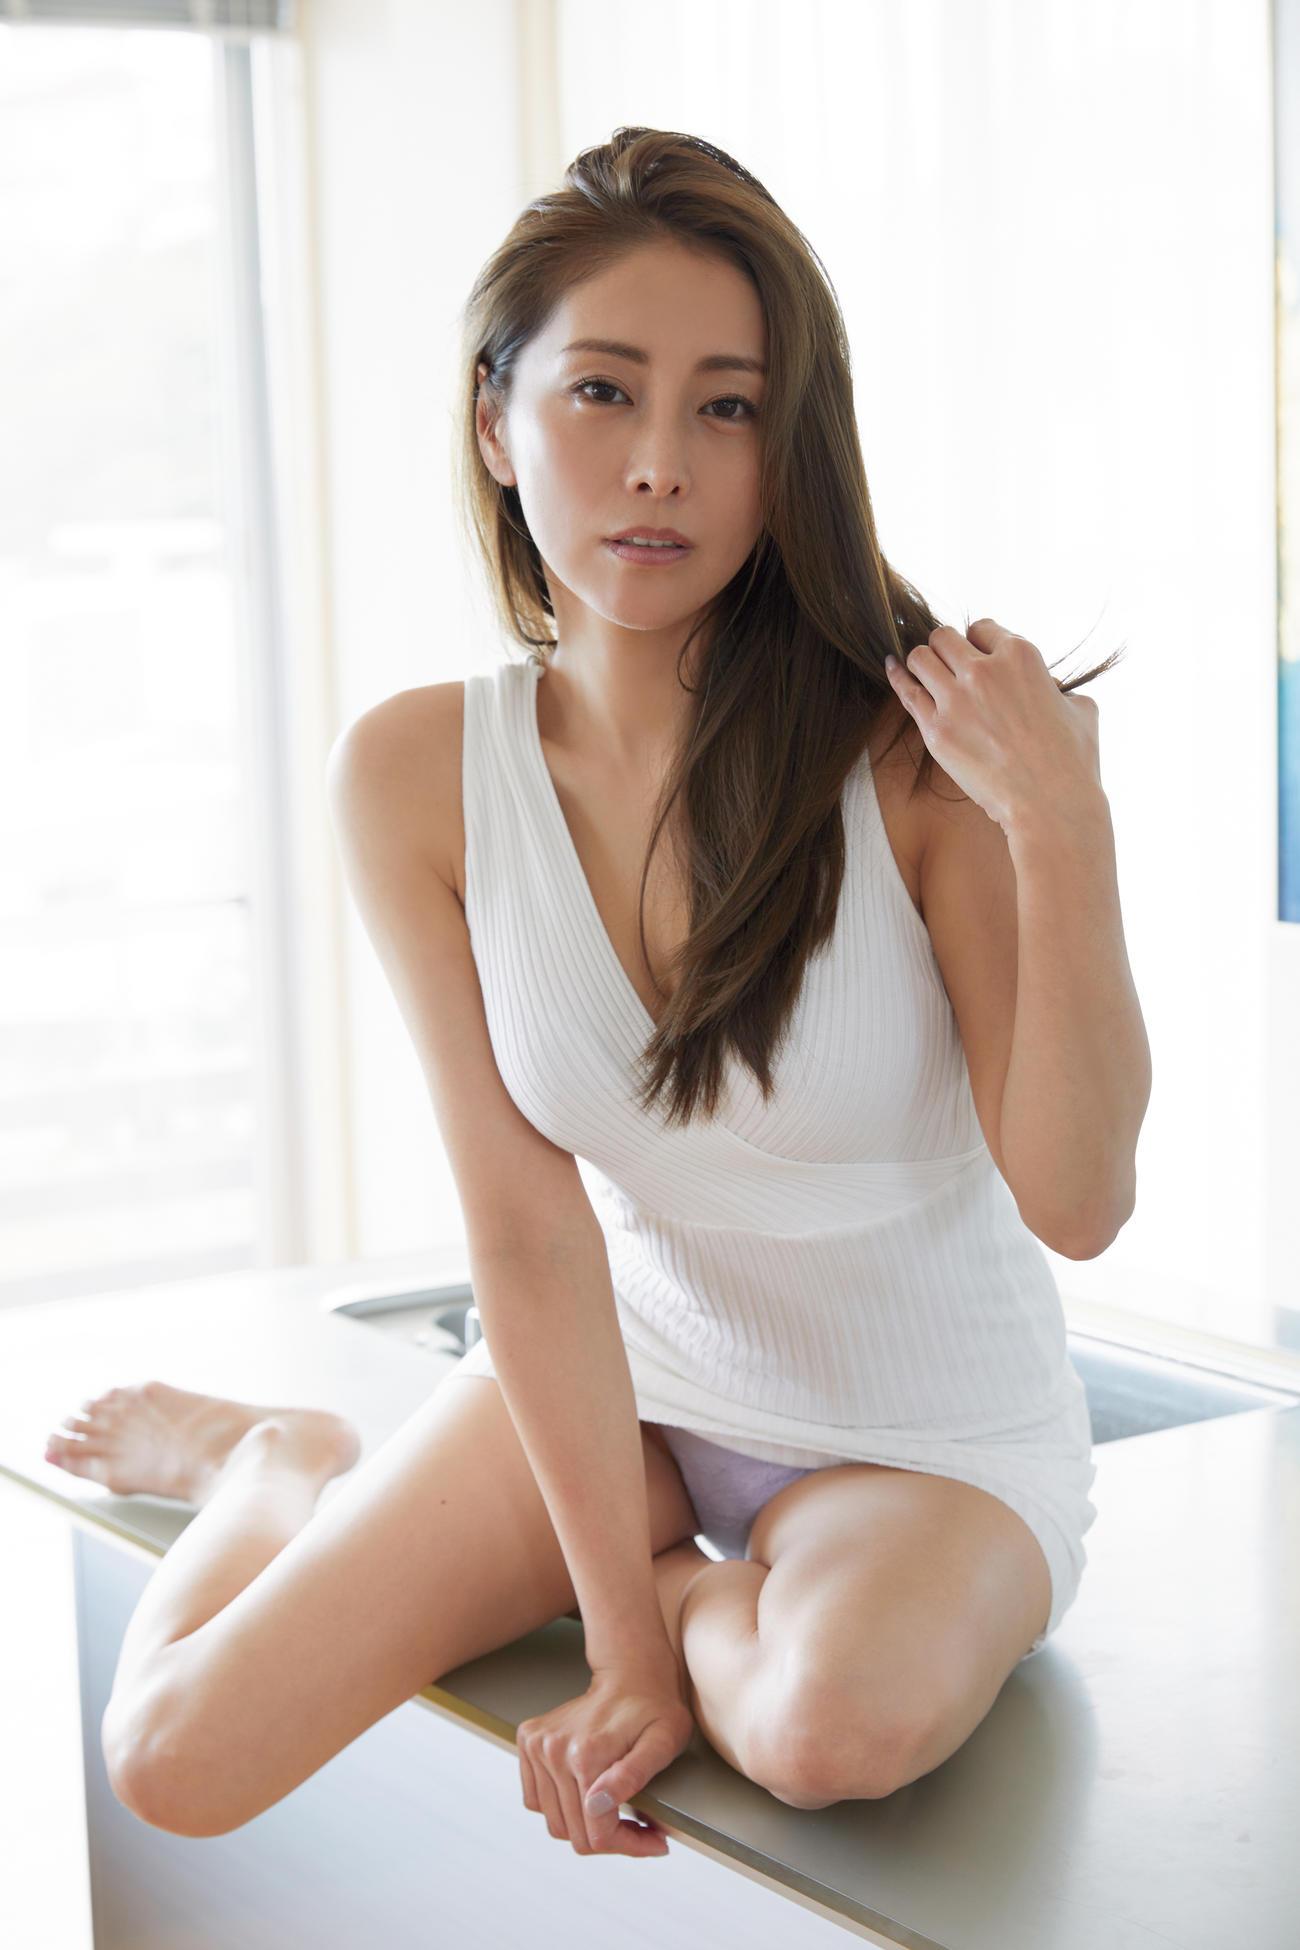 DVD「甘い生活」でセクシーショットを披露する熊切あさ美